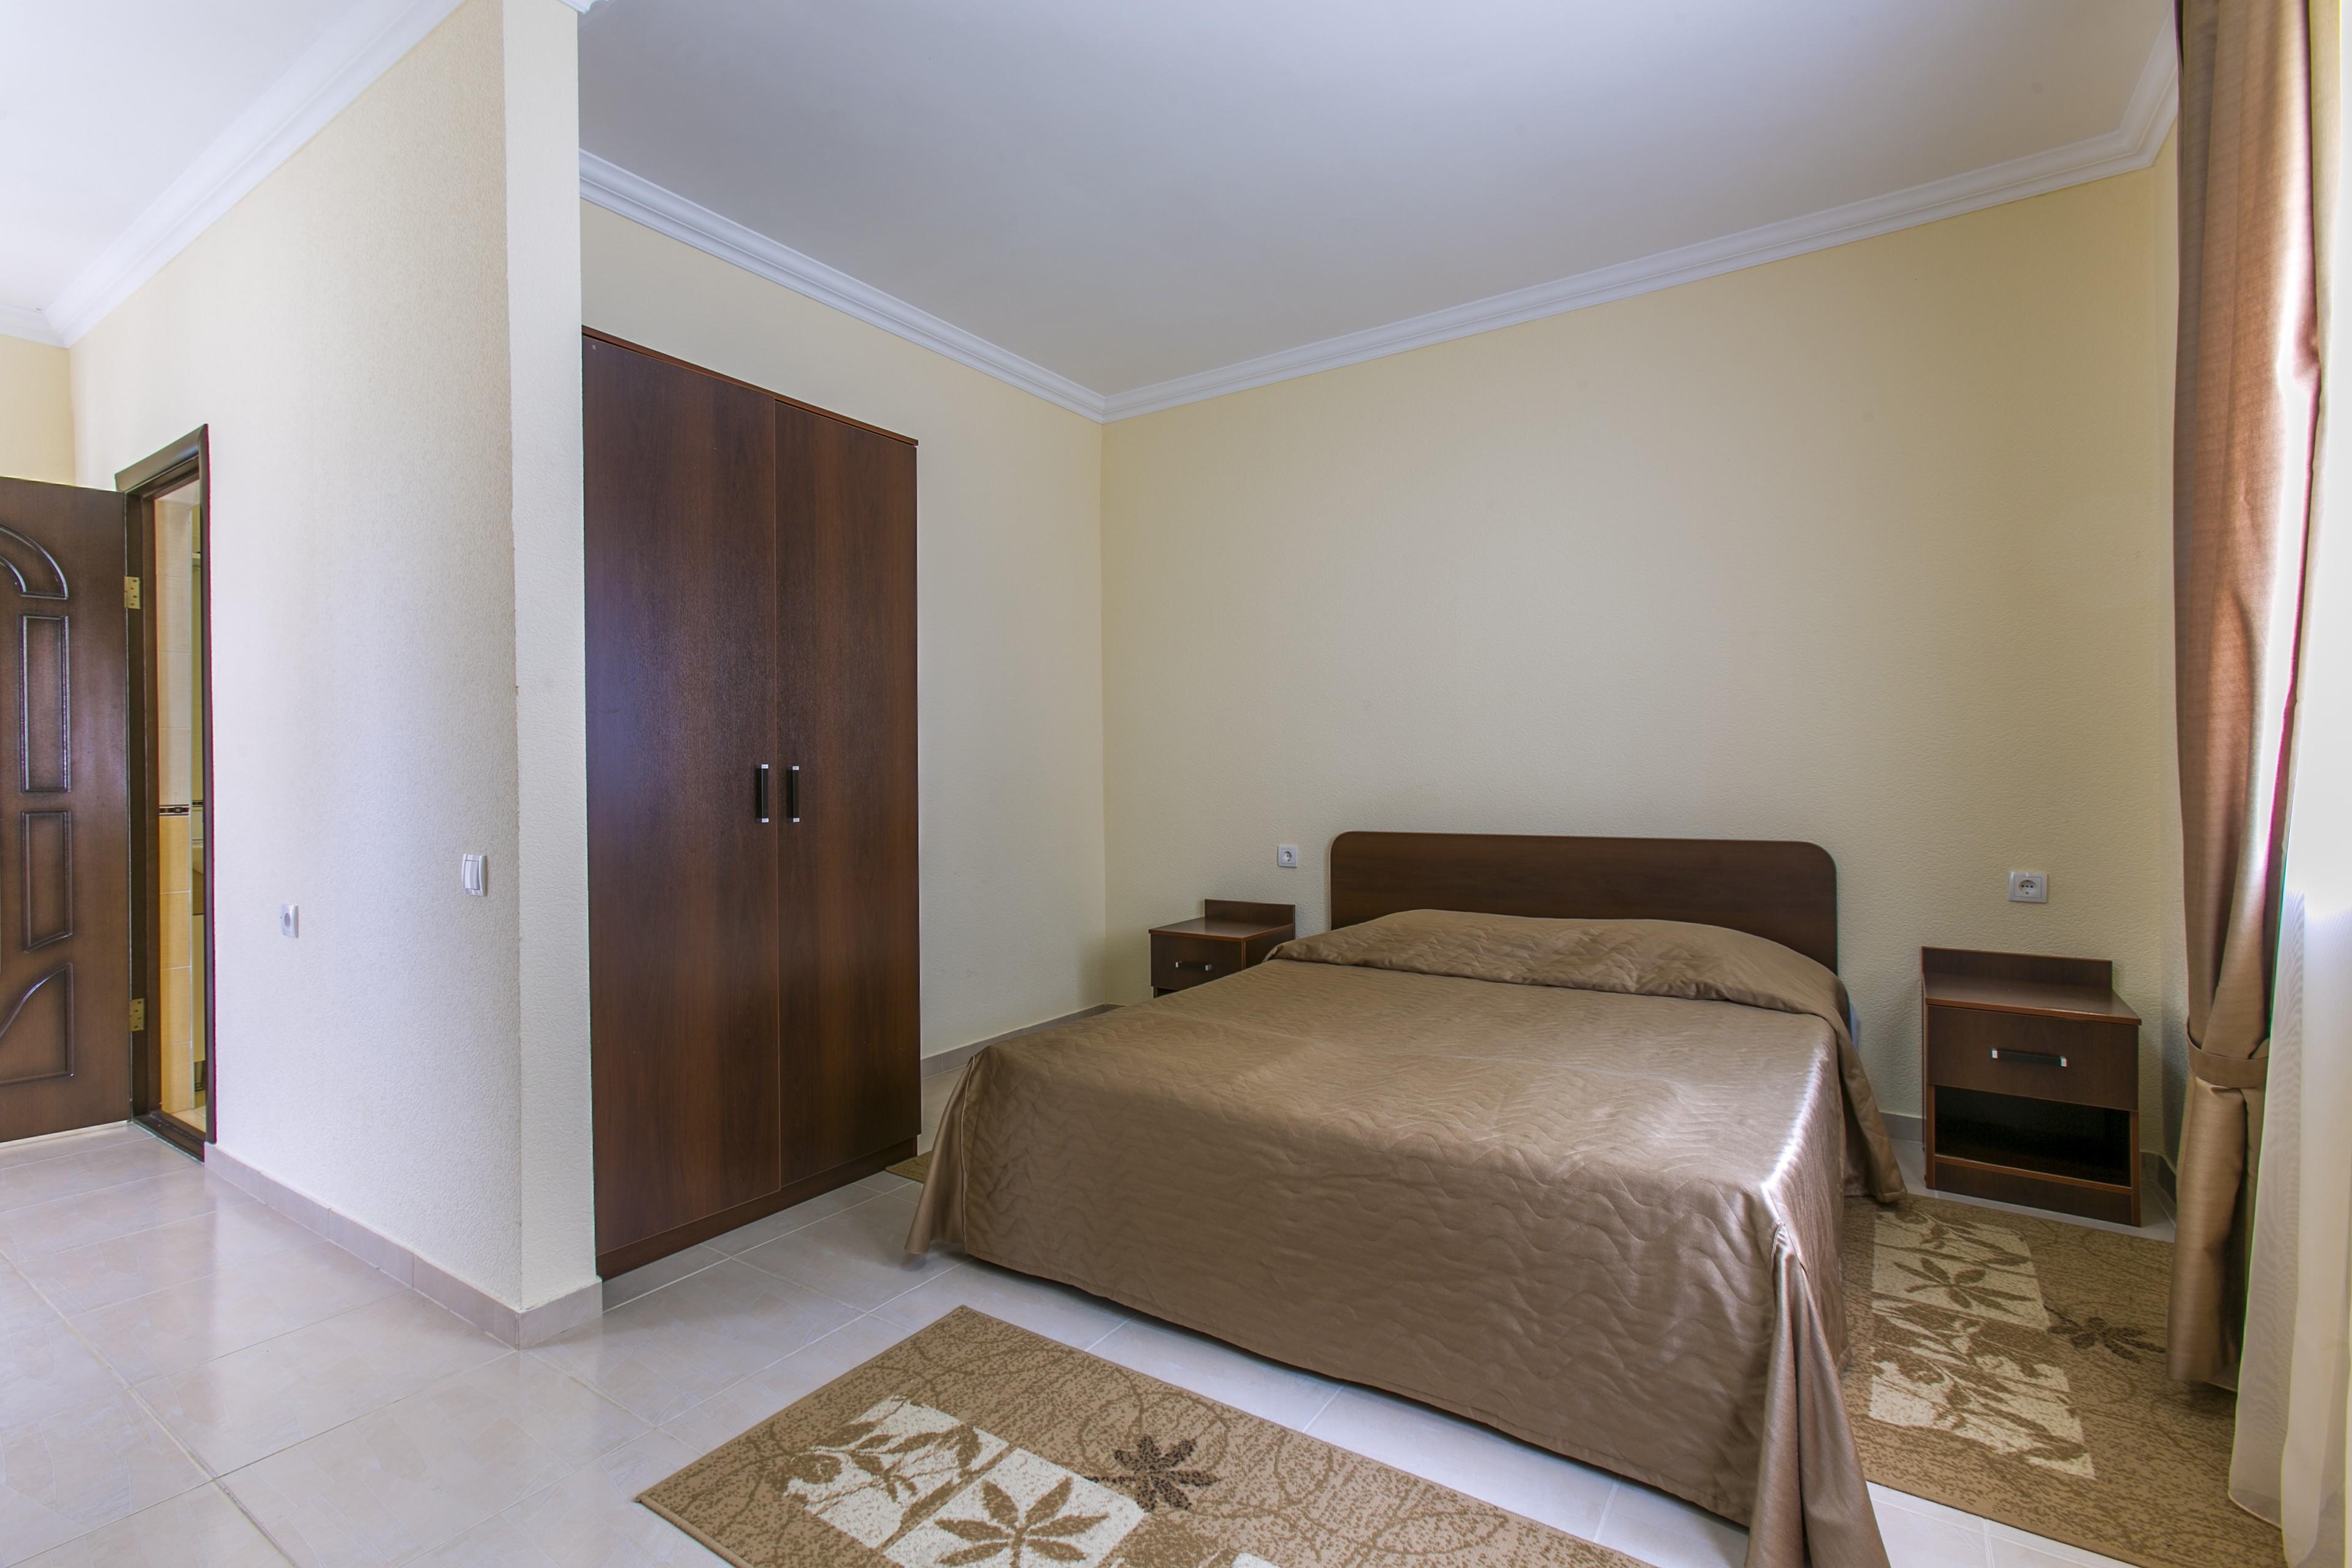 ПК 2-местный 1-комнатный